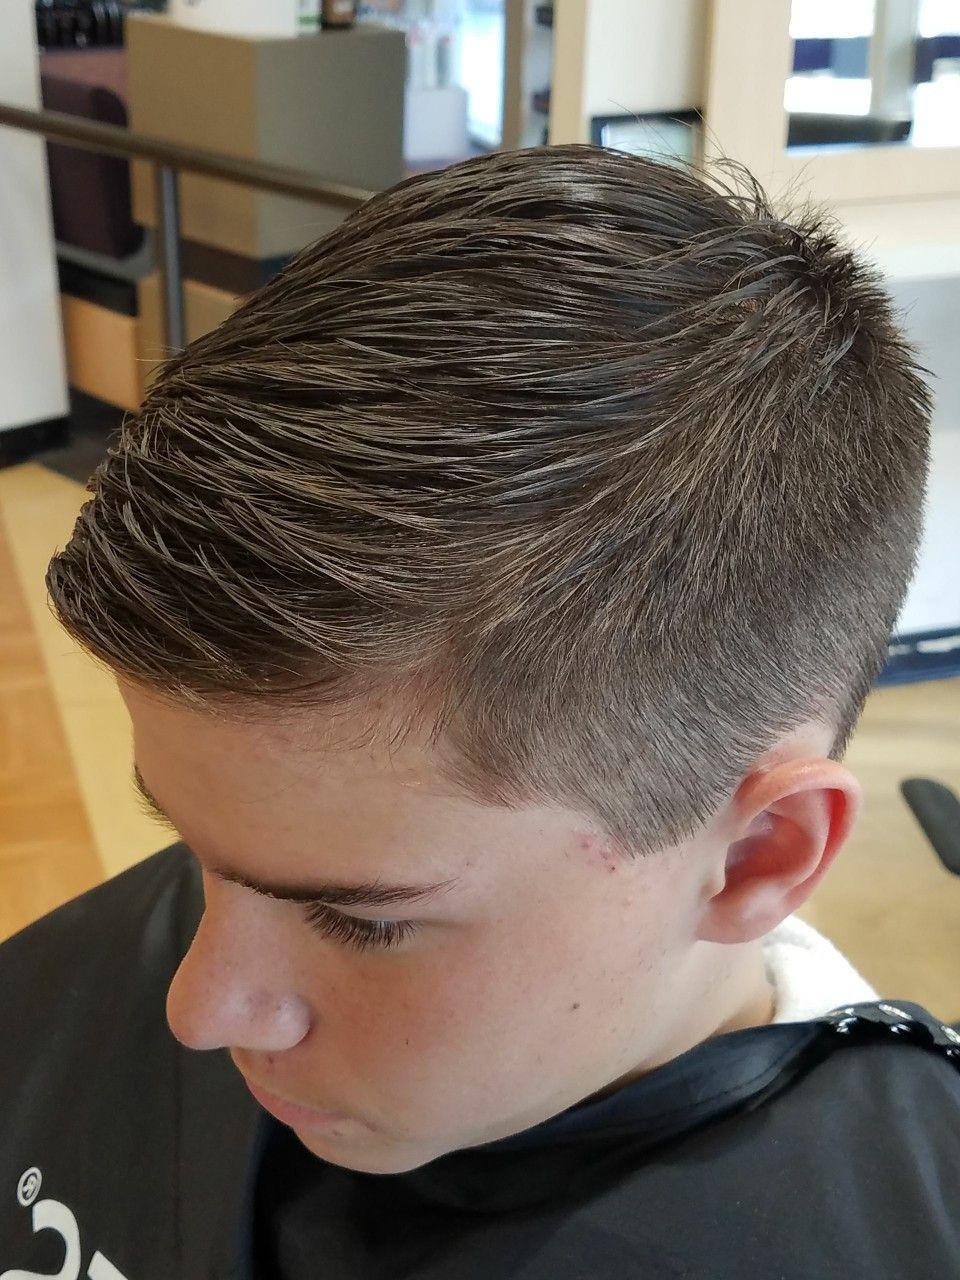 Best ideas about Boys Hair Cut 2019 . Save or Pin Teen boy haircut fade Boys in 2019 Now.